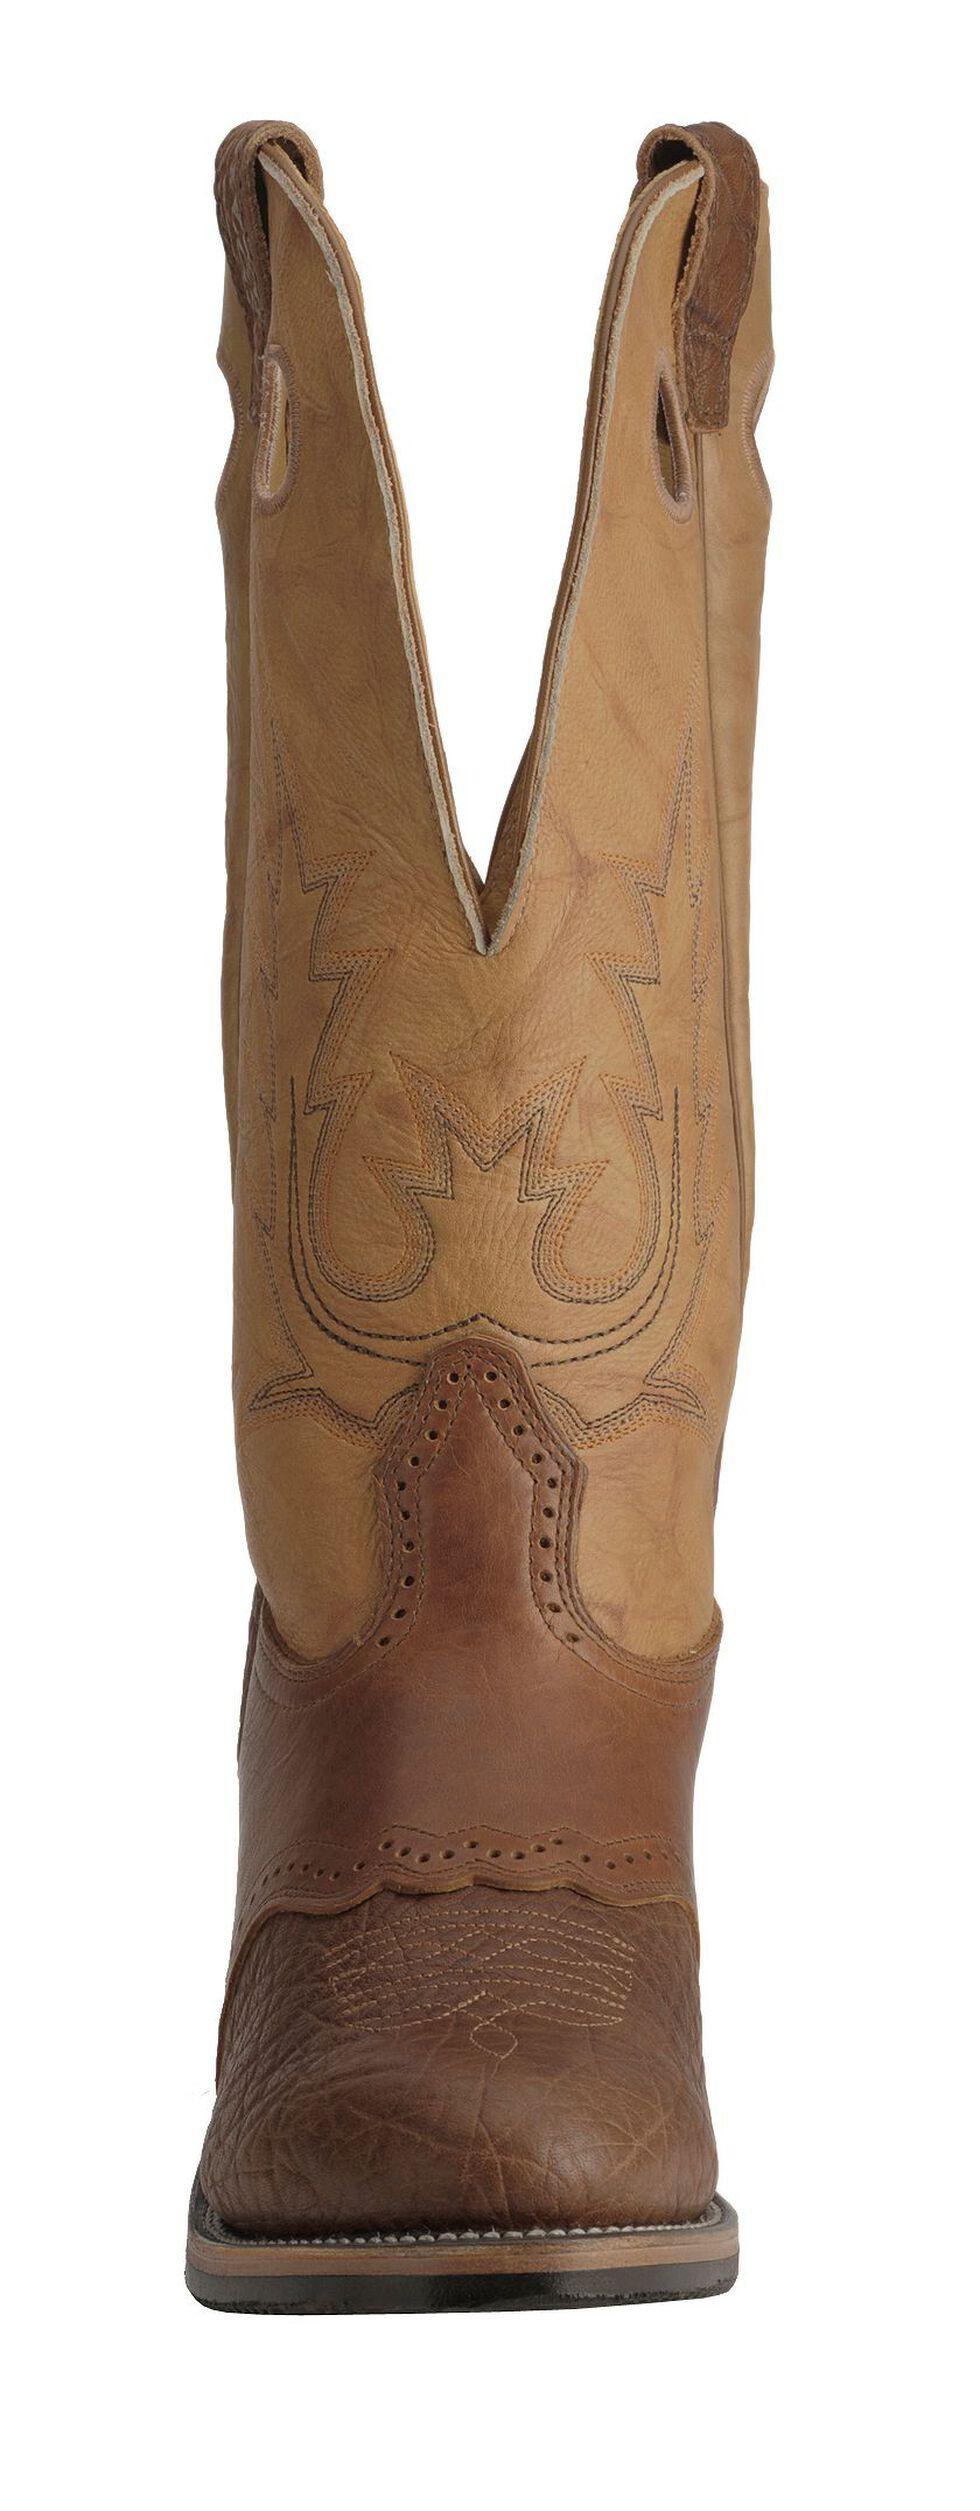 Boulet Buckaroo Saddle Cowboy Boots - Round Toe, Bay Apache, hi-res